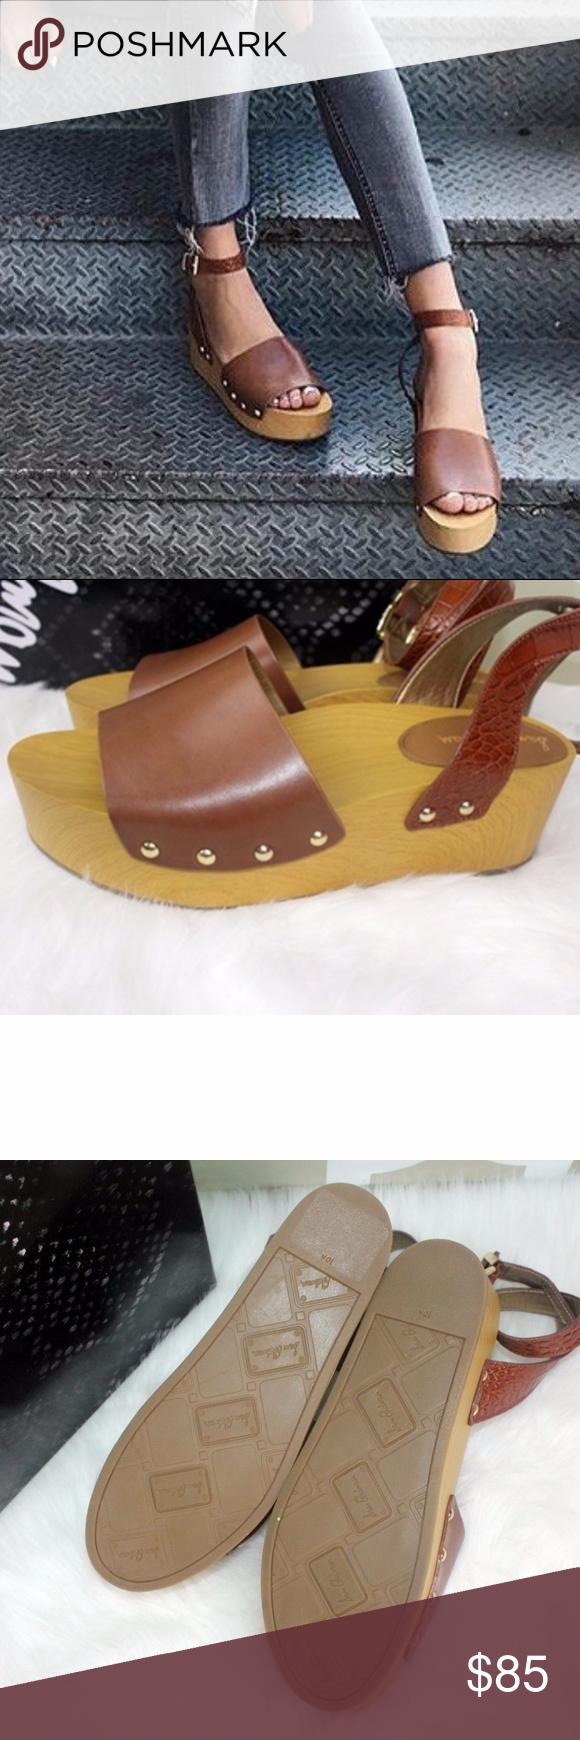 43ad7cdb8 Sam Edelman Women s Brynn Platform Sandal Ankle St Sam Edelman Women s Brynn  Platform Sandal Ankle Strap Saddle Leather Sz 10 1 2 M Widest Part of Sole  3 ...